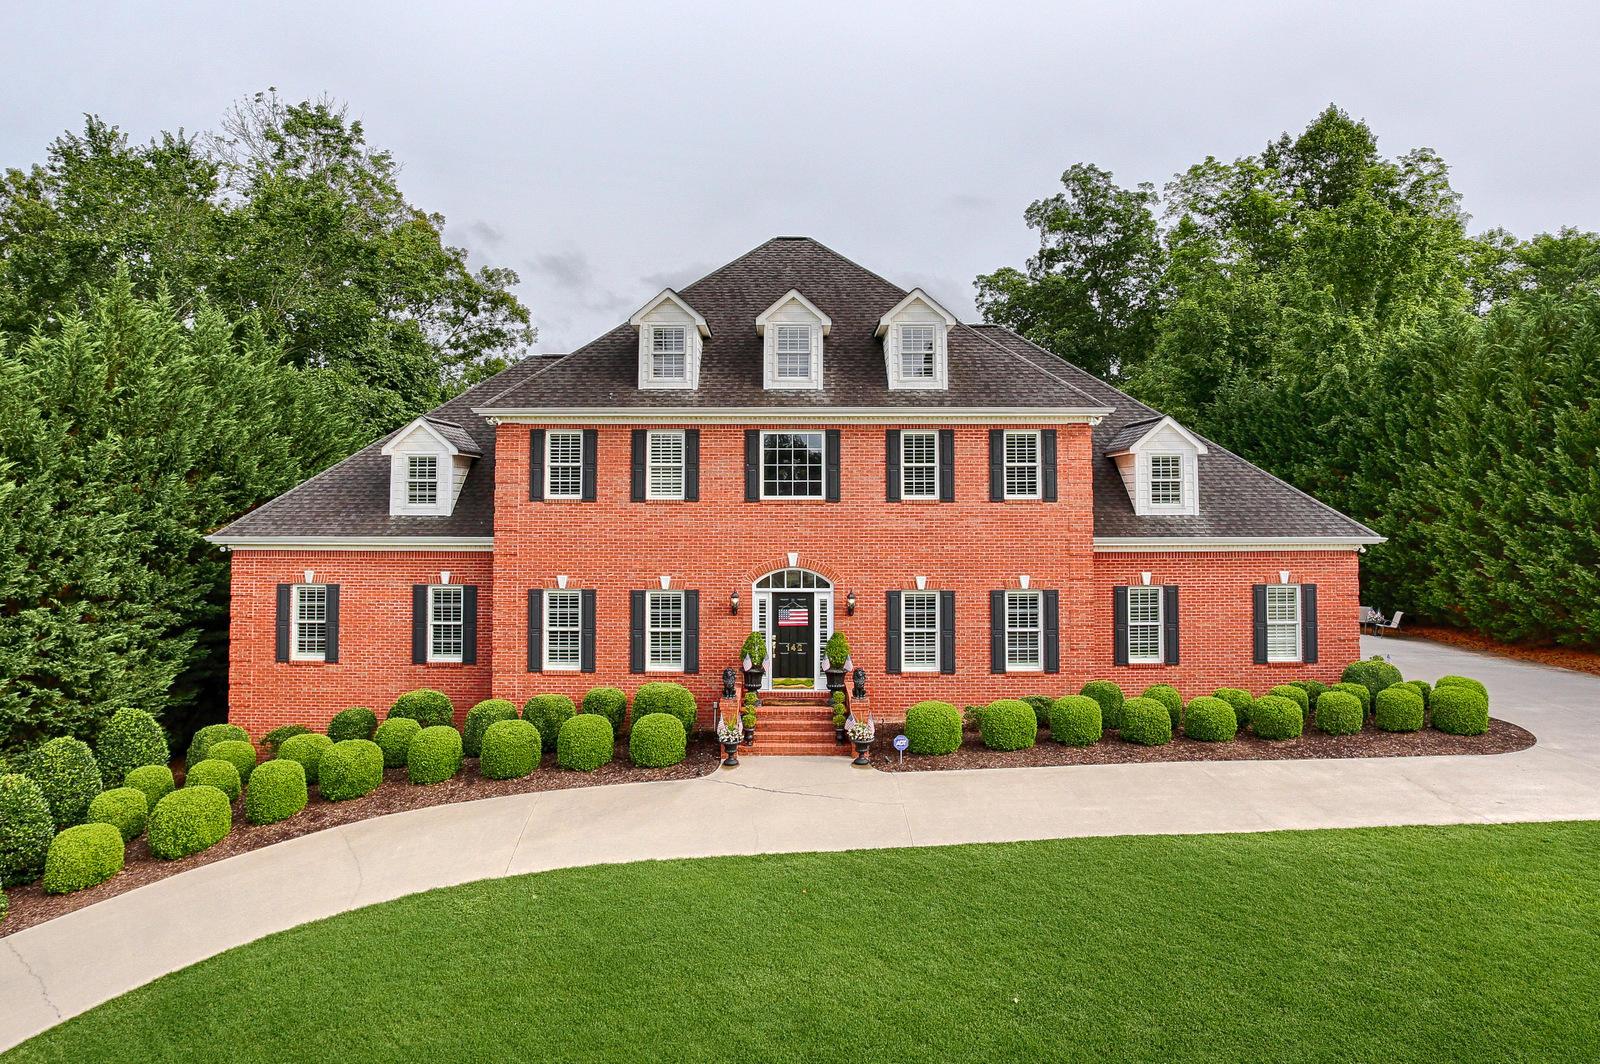 20190401200856682232000000-o Oak Ridge anderson county homes for sale